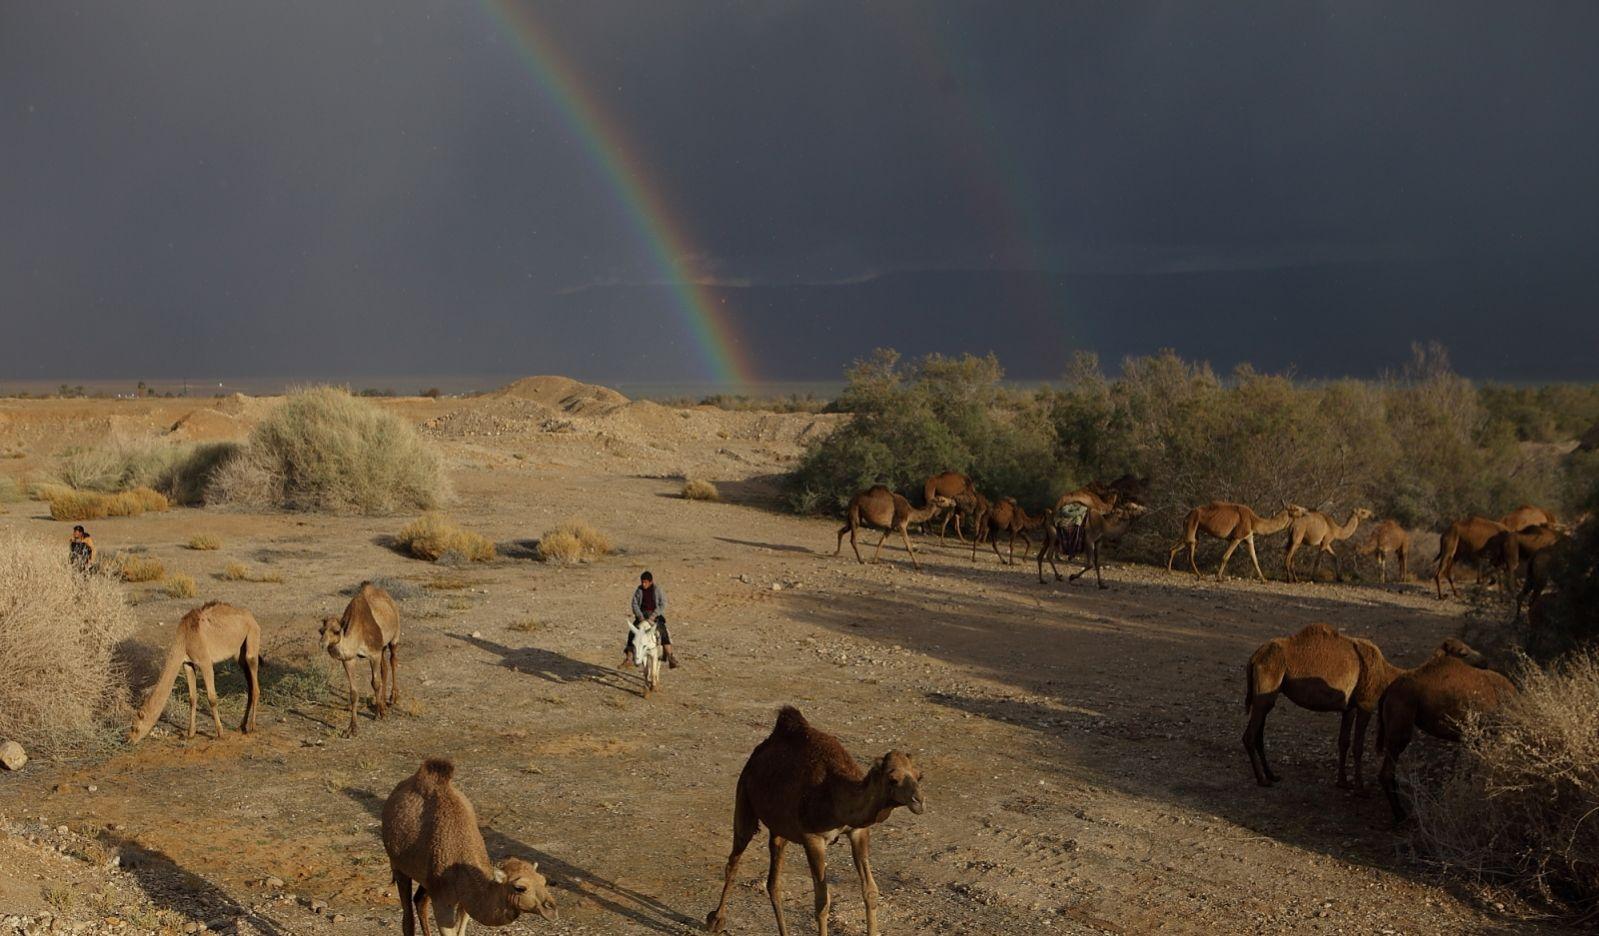 Camels wander near the Dead Sea under a rainbow sky. Photo by Yaakov Naumi/FLASH90